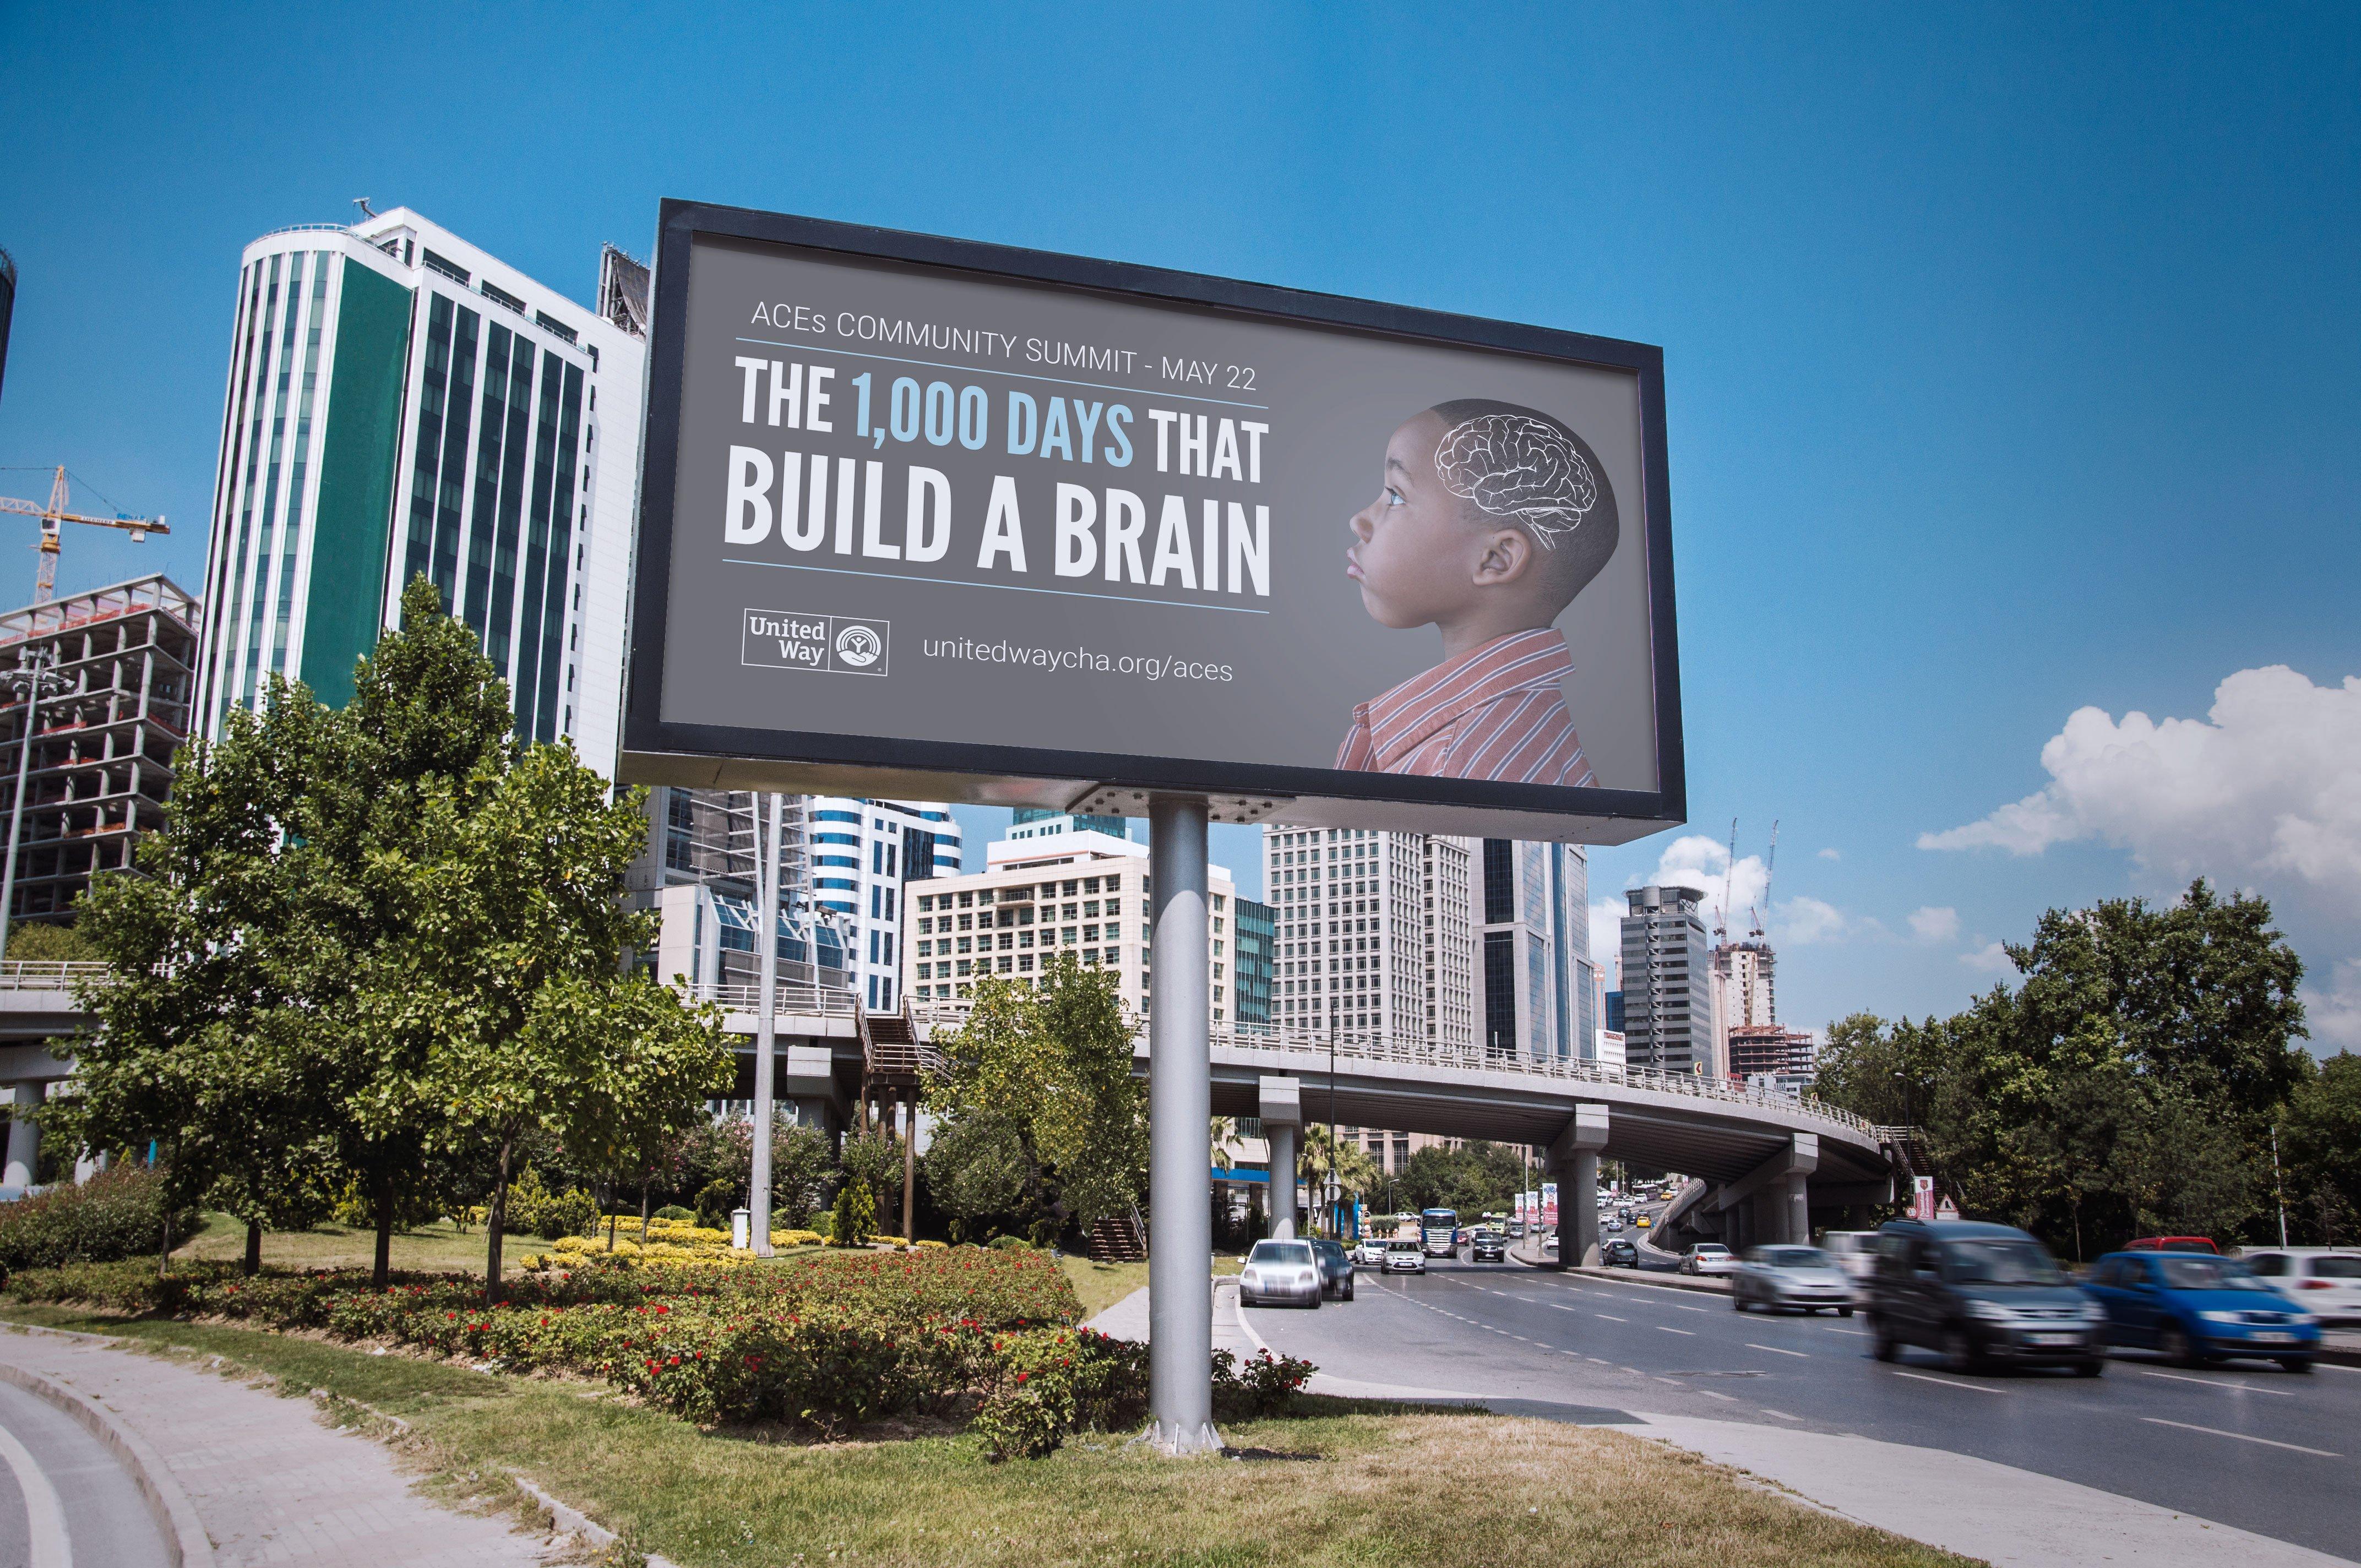 uw-billboard.jpg